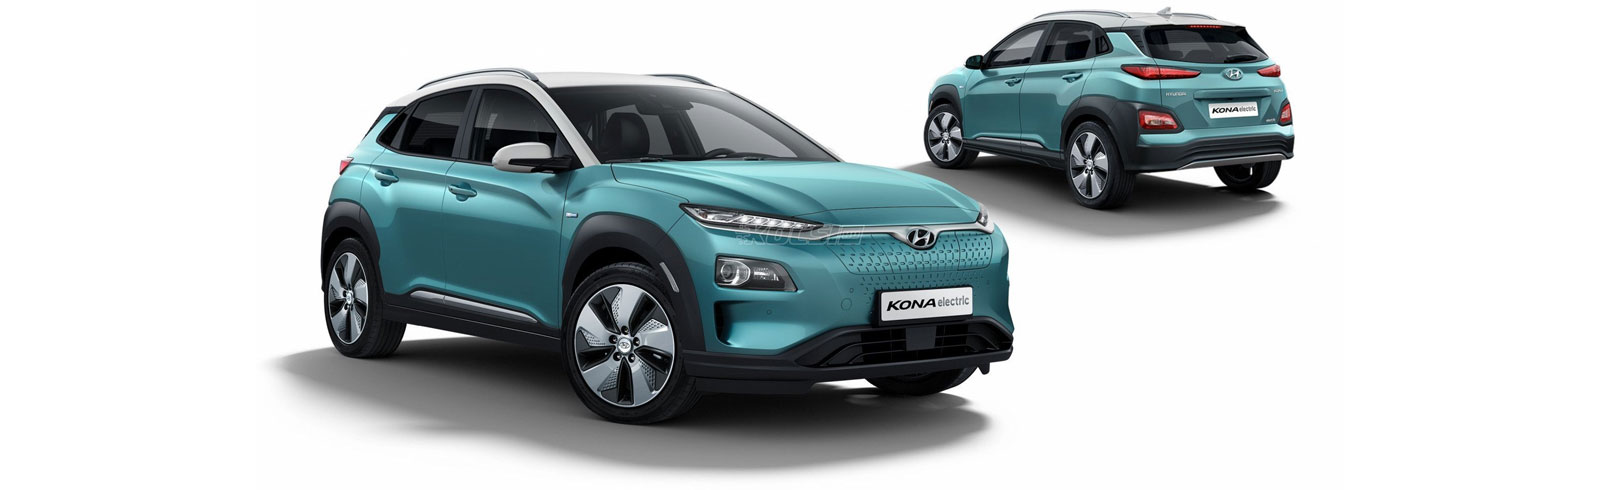 Hyundai wants to build the Kona EV in its Czech Republic plant